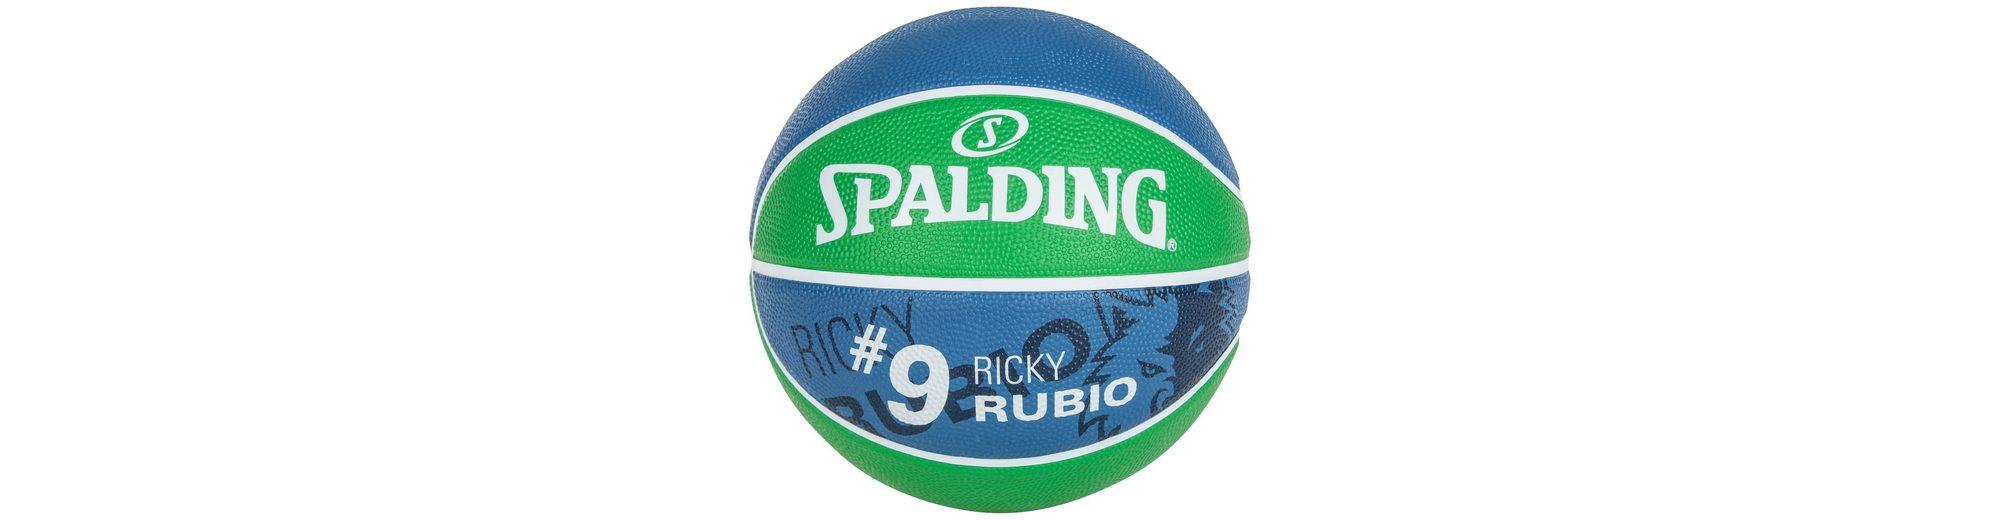 SPALDING NBA Player Ricky Rubio Basketball